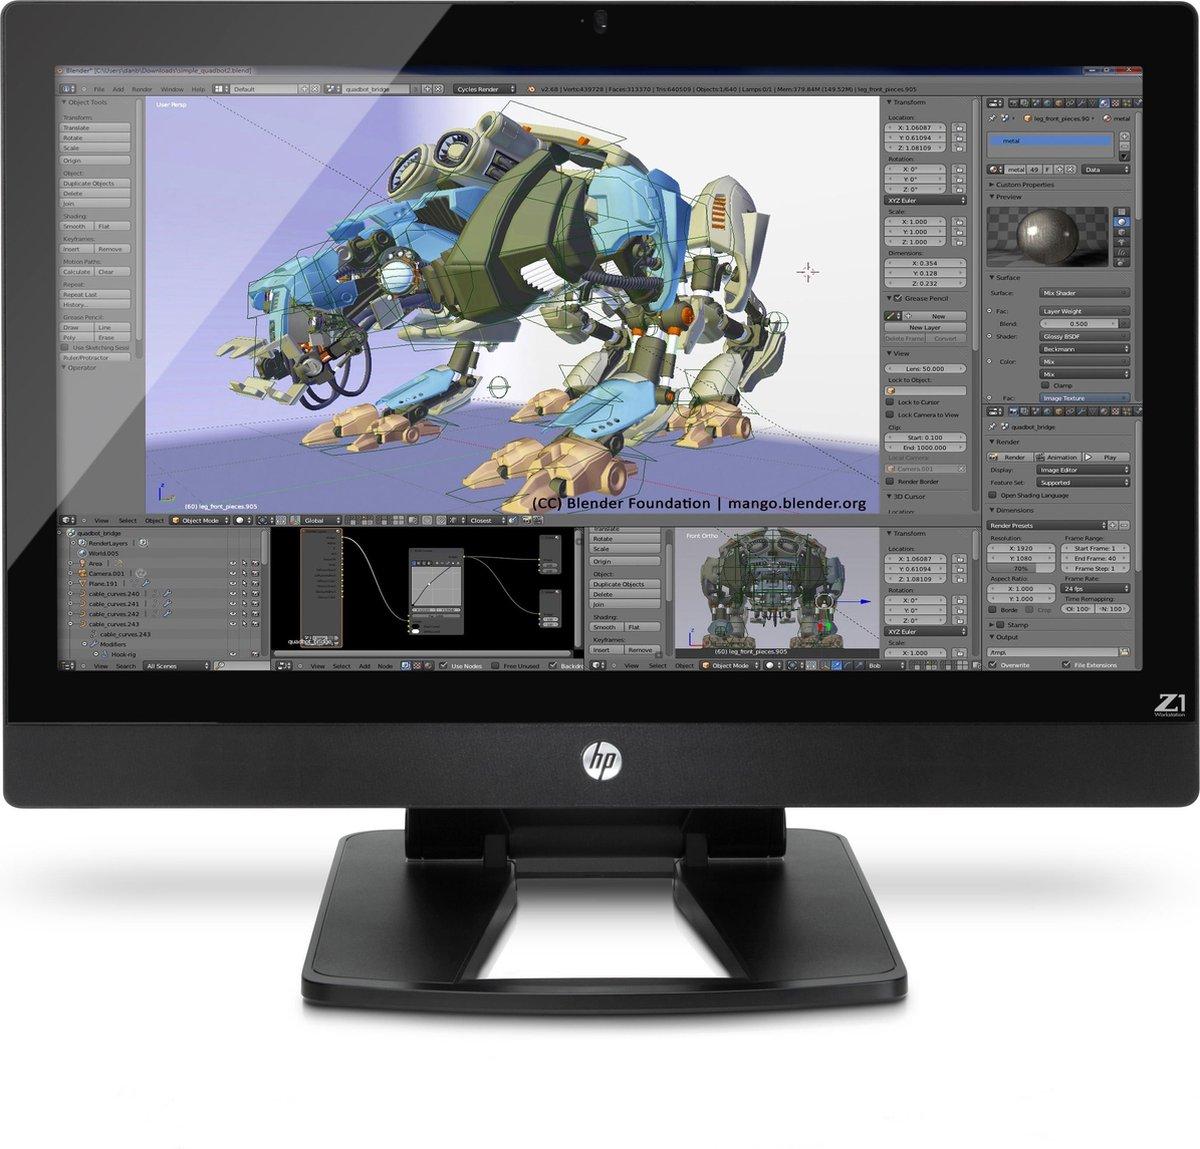 "HP Z1 G2 3.3GHz E3-1226V3 27"" 2560 x 1440Pixels Zwart, Zilver All-in-One workstation"